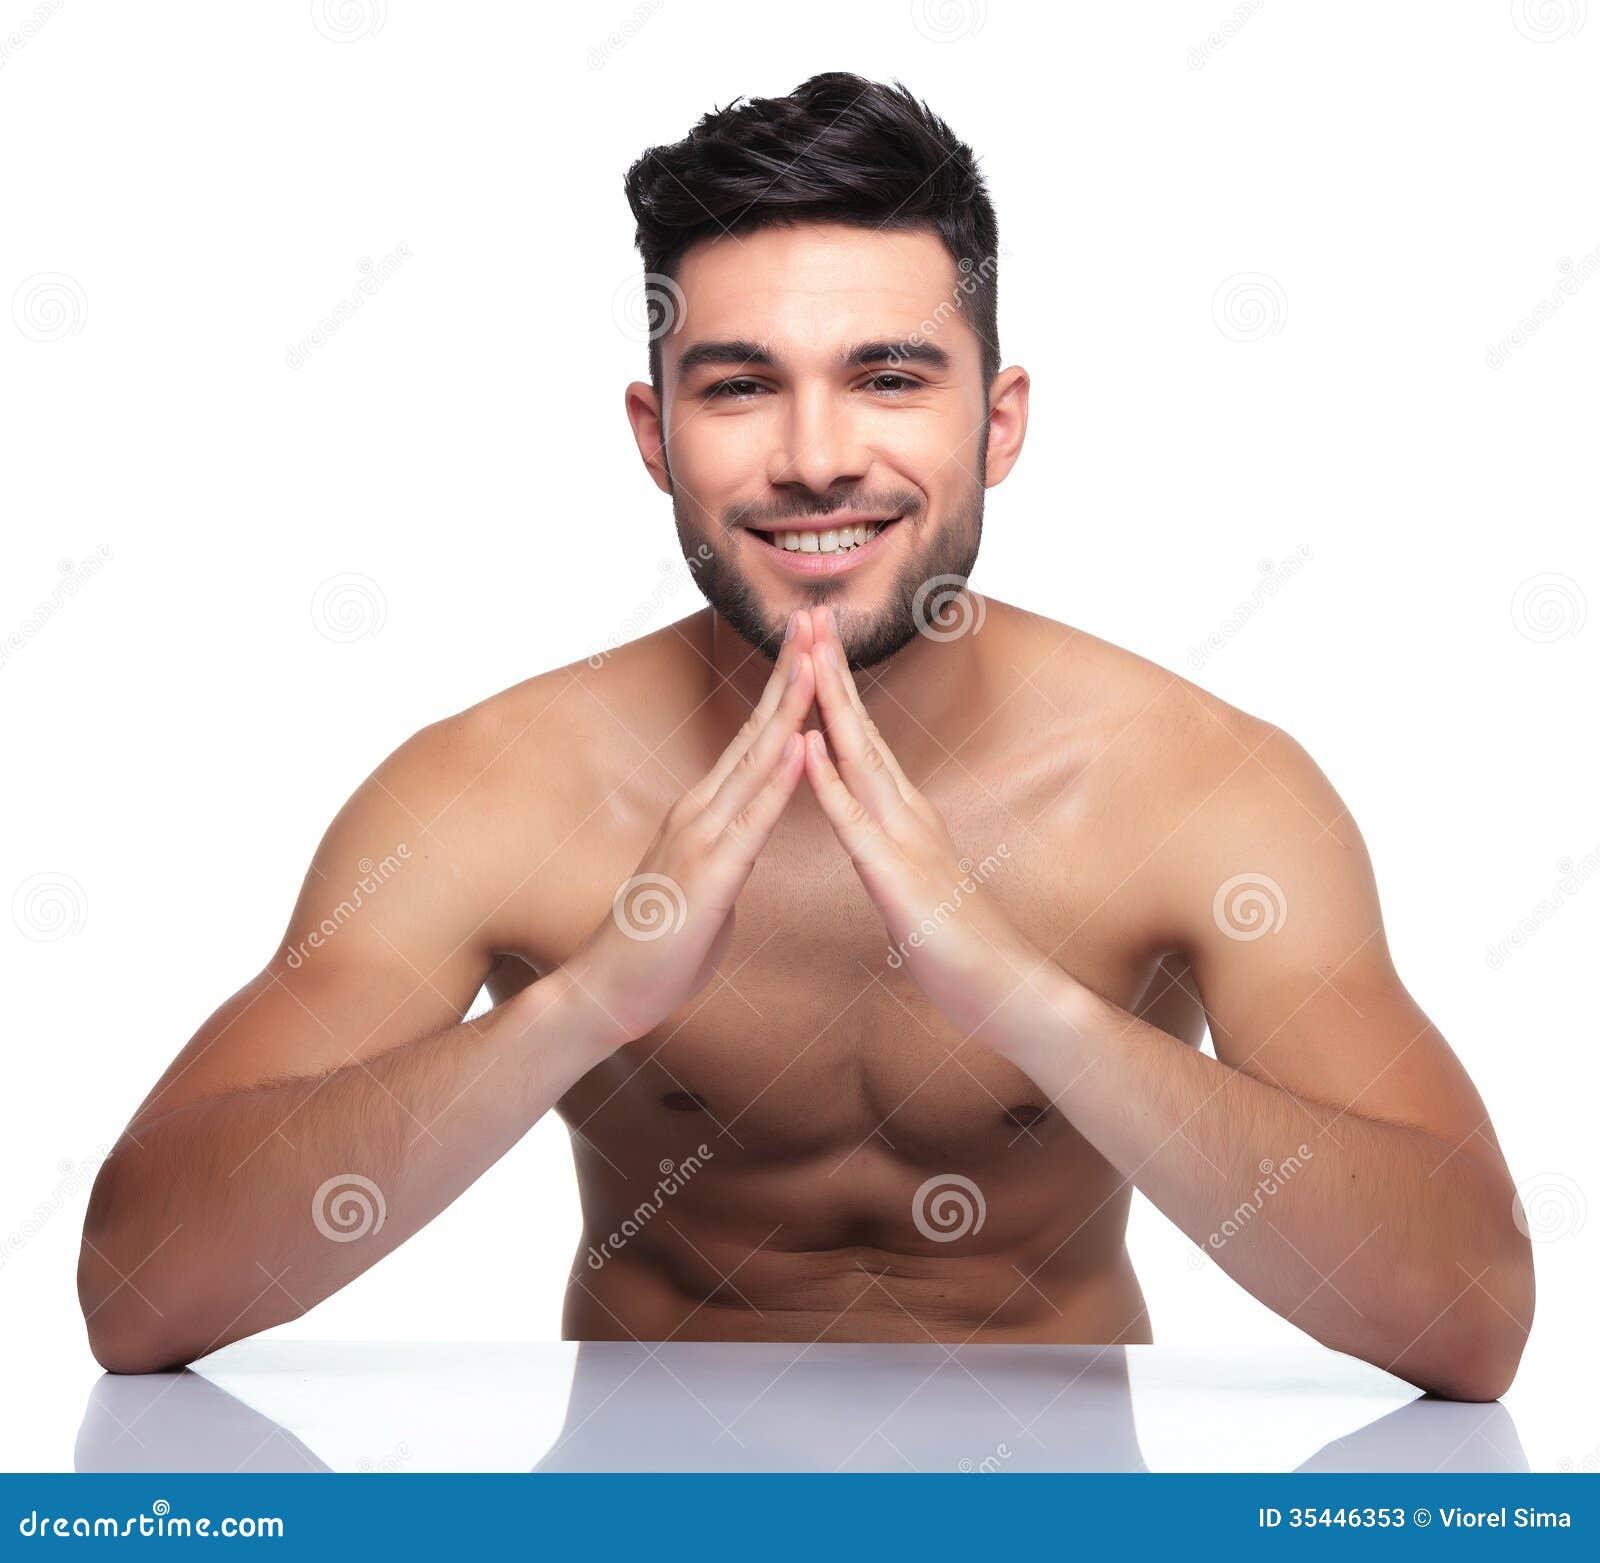 Fotos de hombres desnudos - VICE